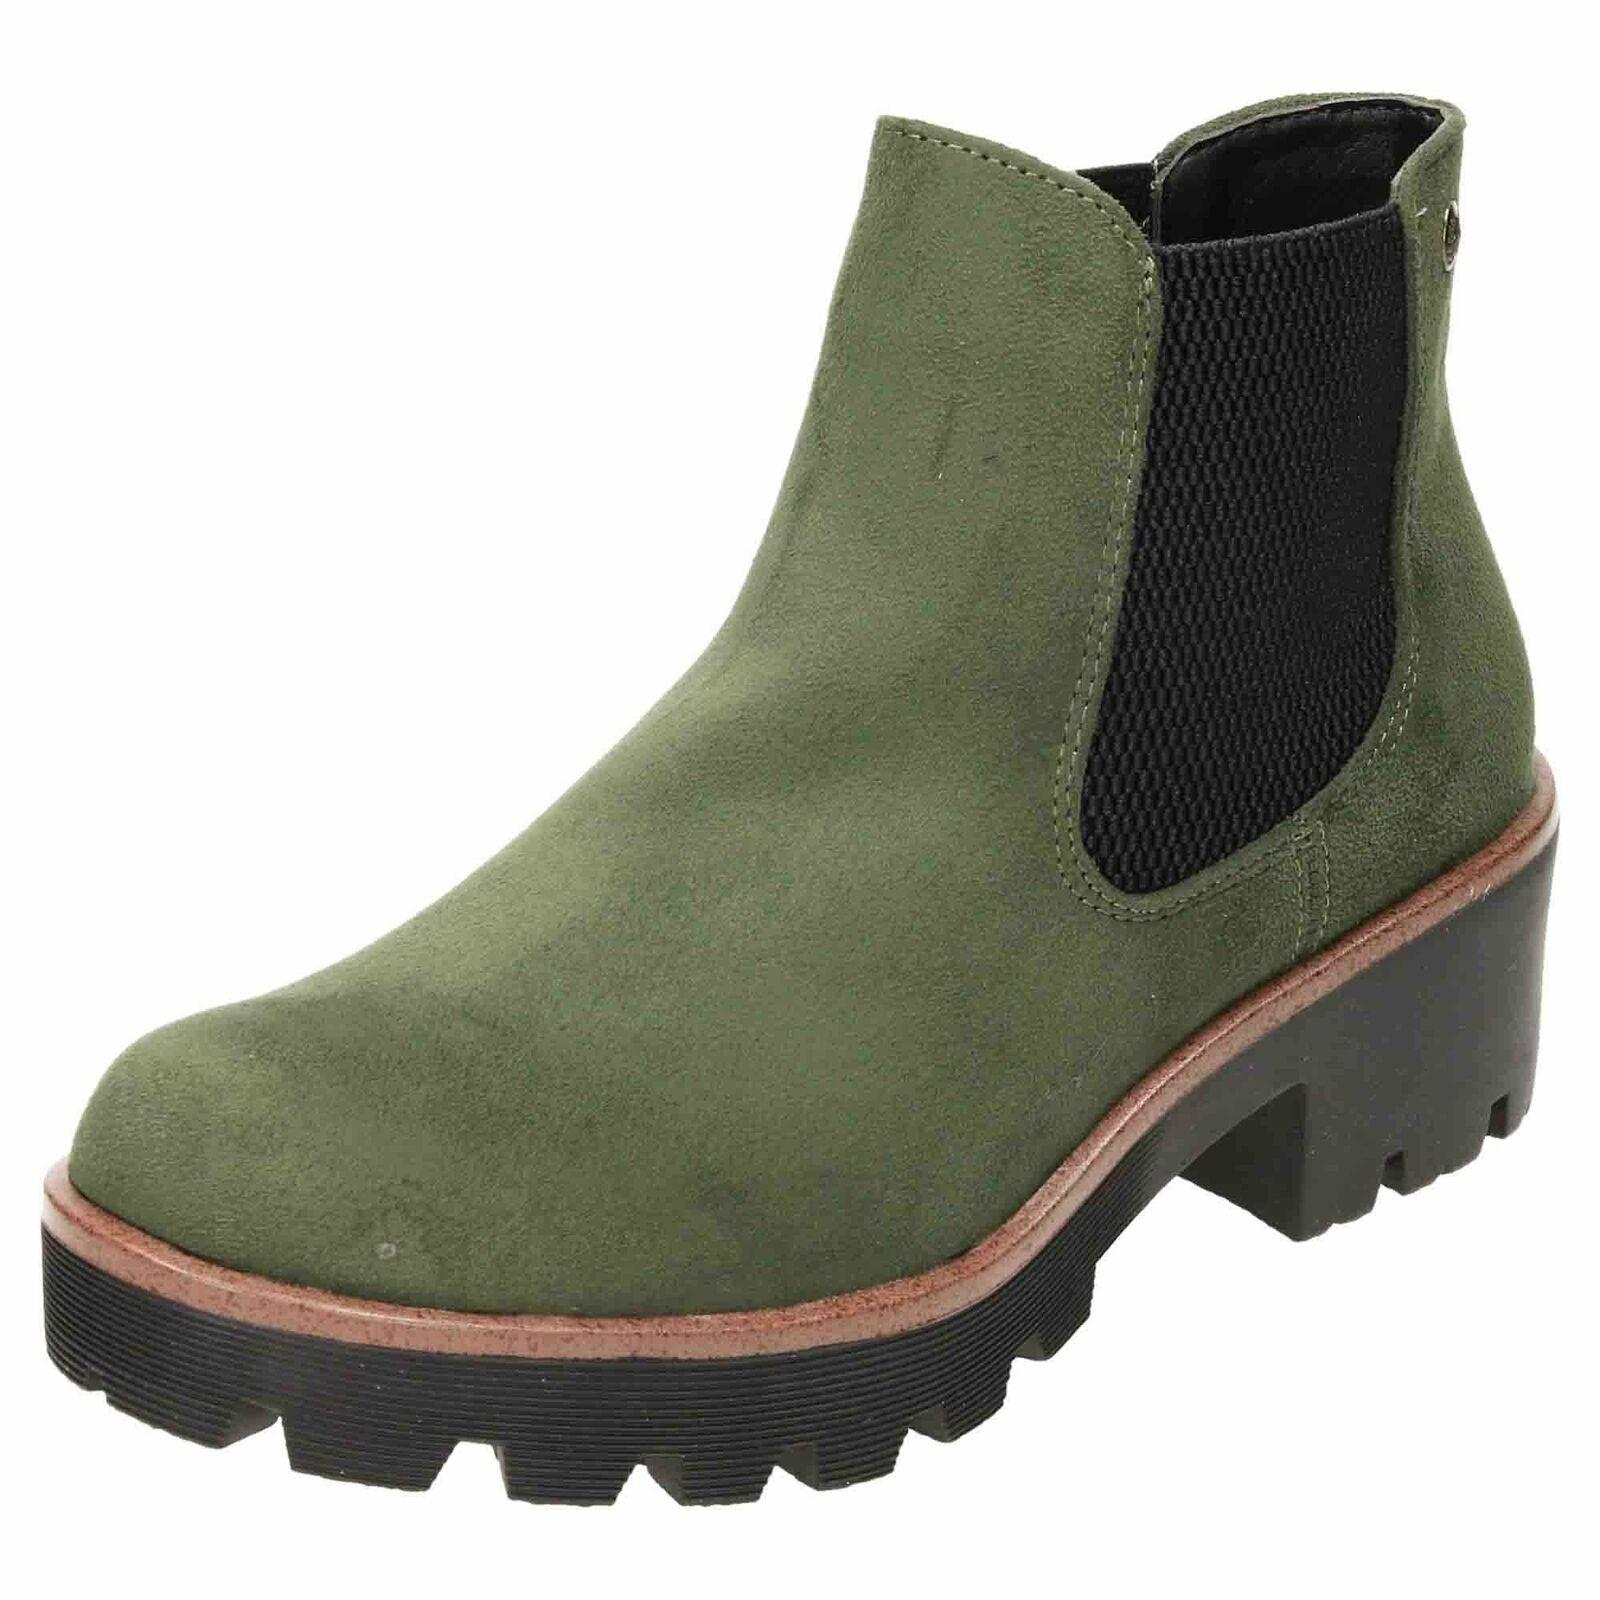 schuhe Flat Stiefel Ankle Suede Grün Chelsea Chunky Rieker